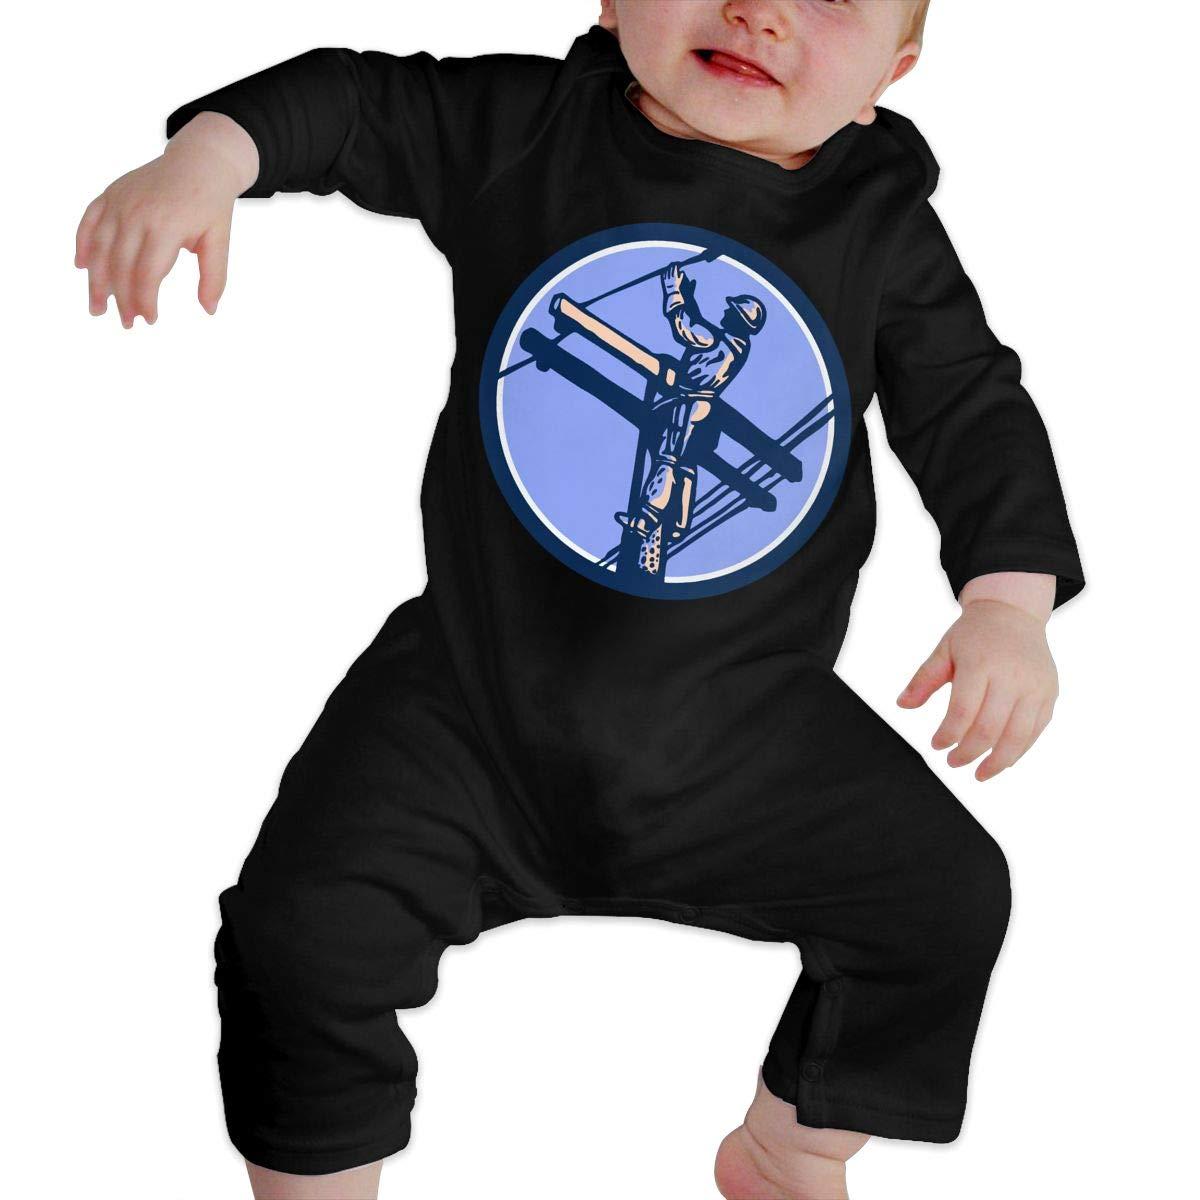 YUE--3BODY A Power Lineman Toddler Baby Boy Girl Long Sleeve Infant Bodysuit